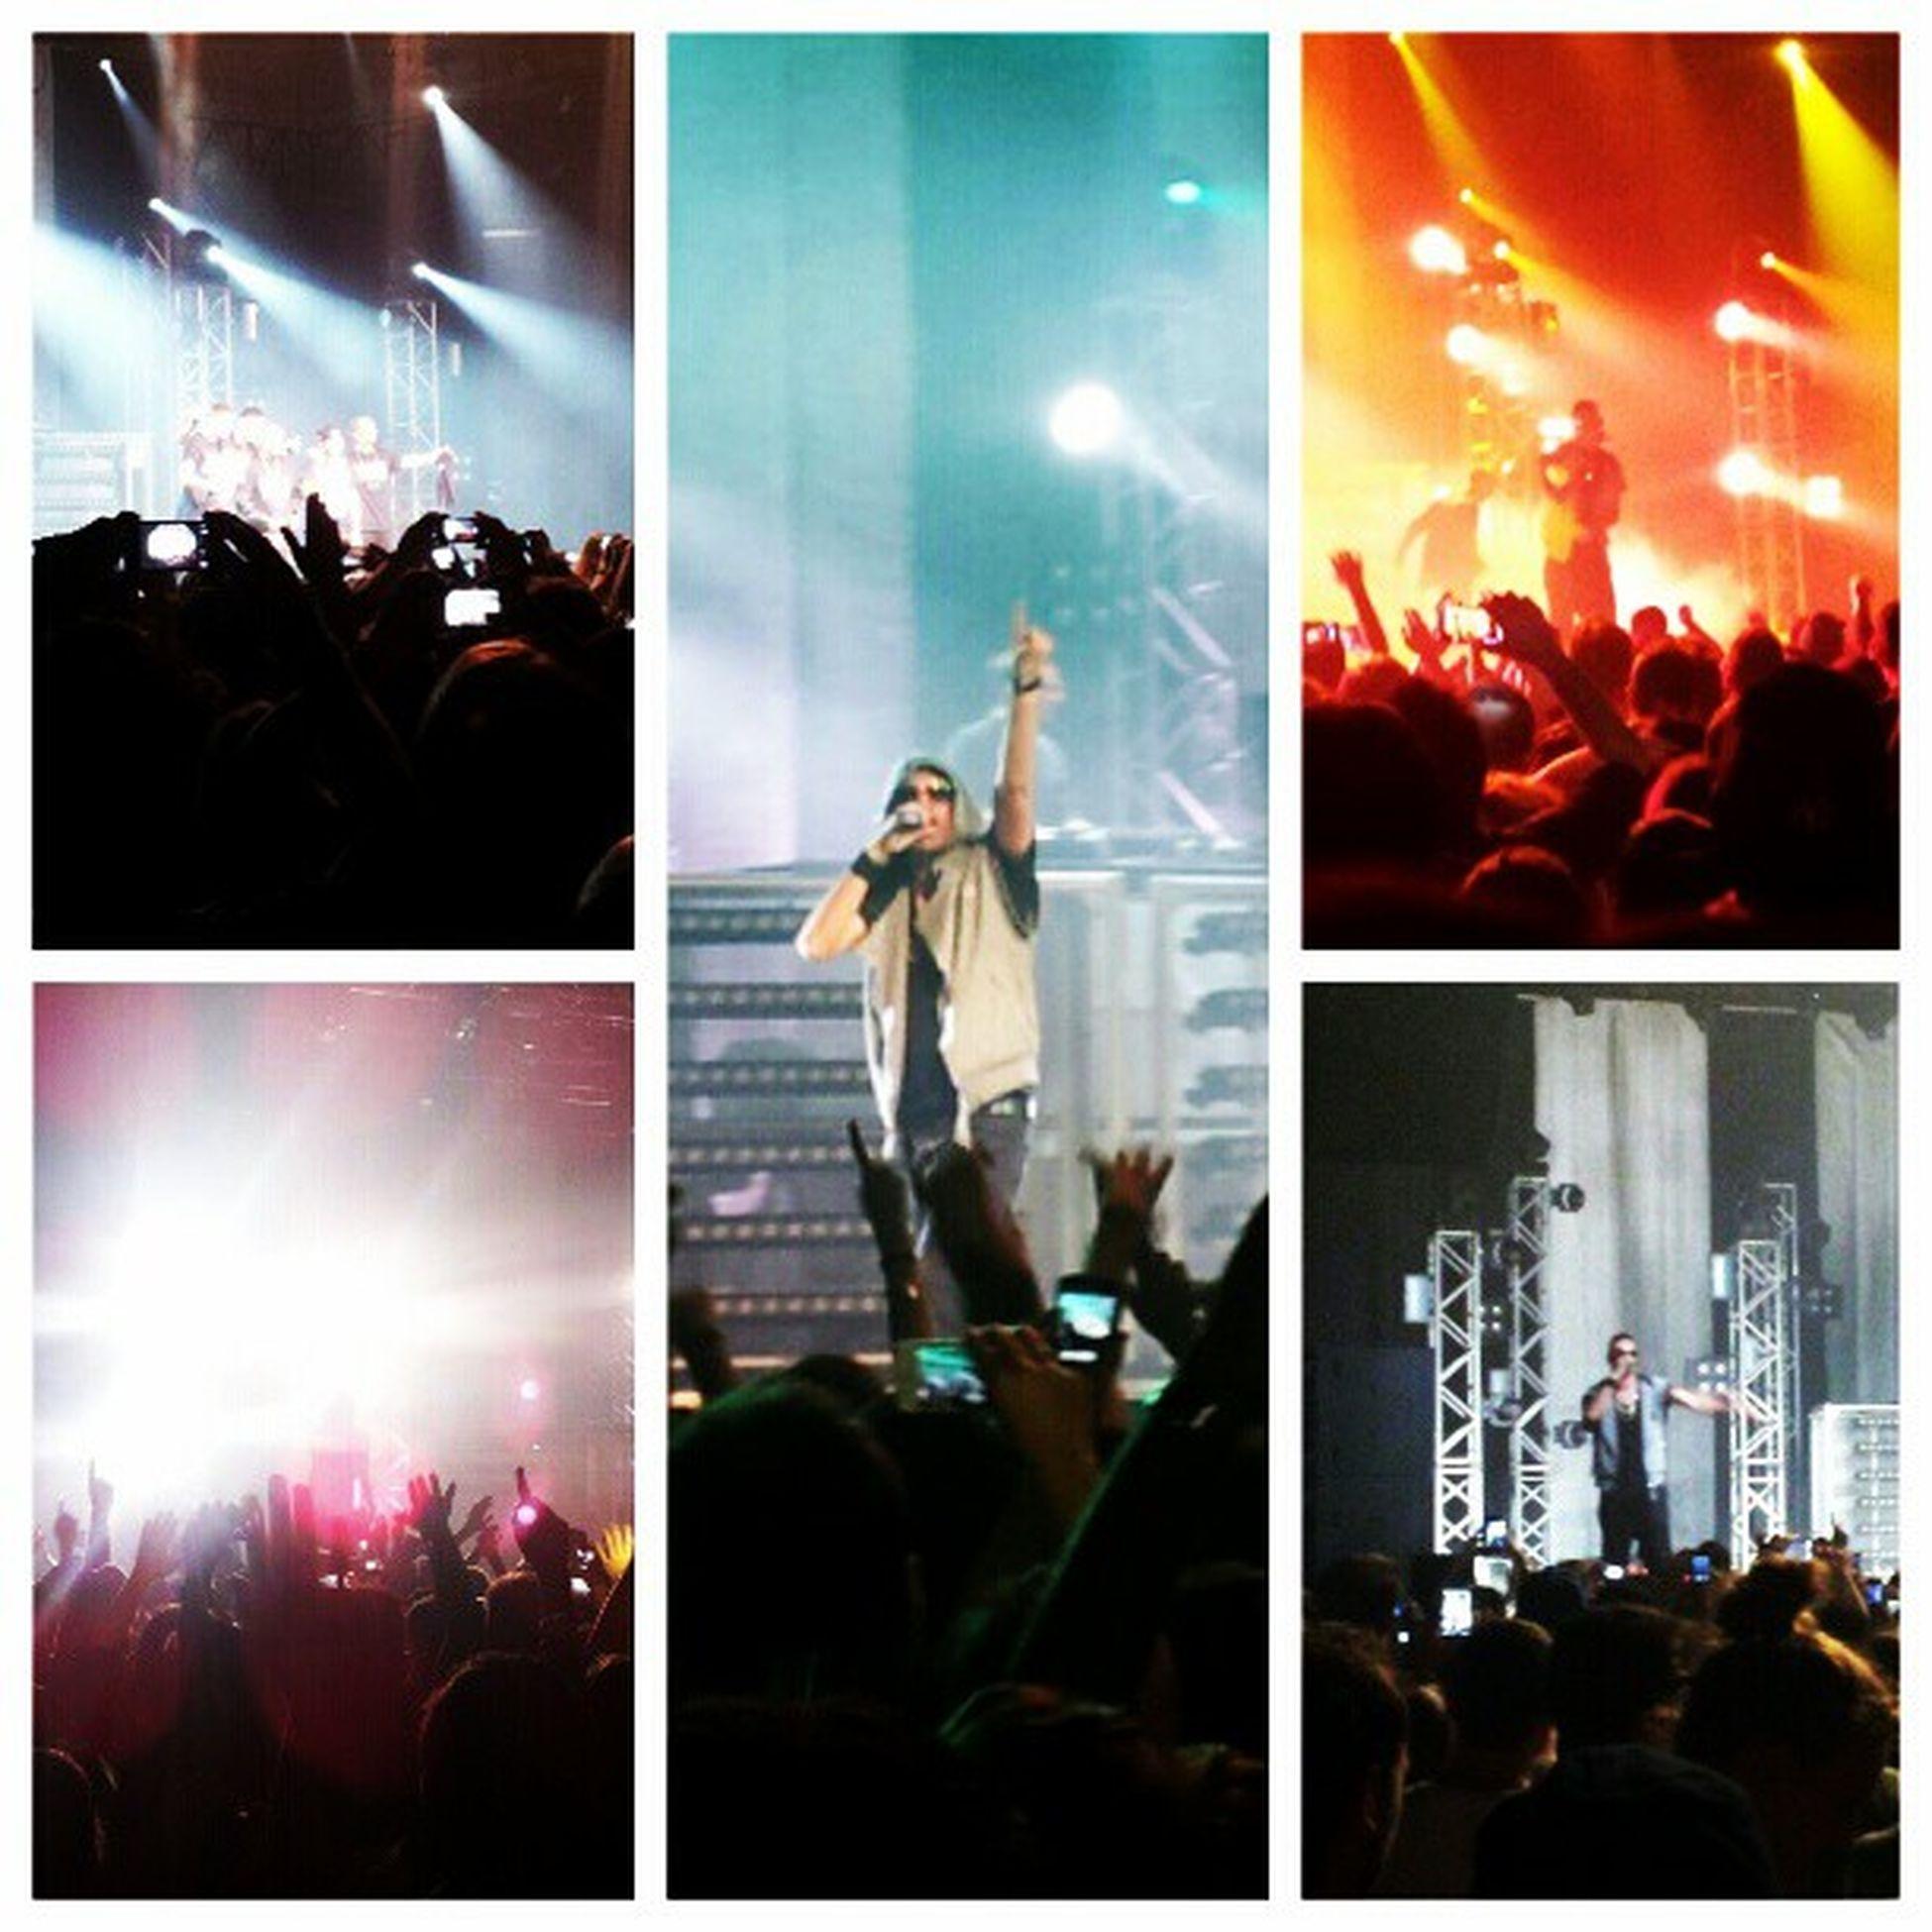 Marracash  GiustoUnGiroTour Milano RocciaMusic Onstage KingDelRap DayOne